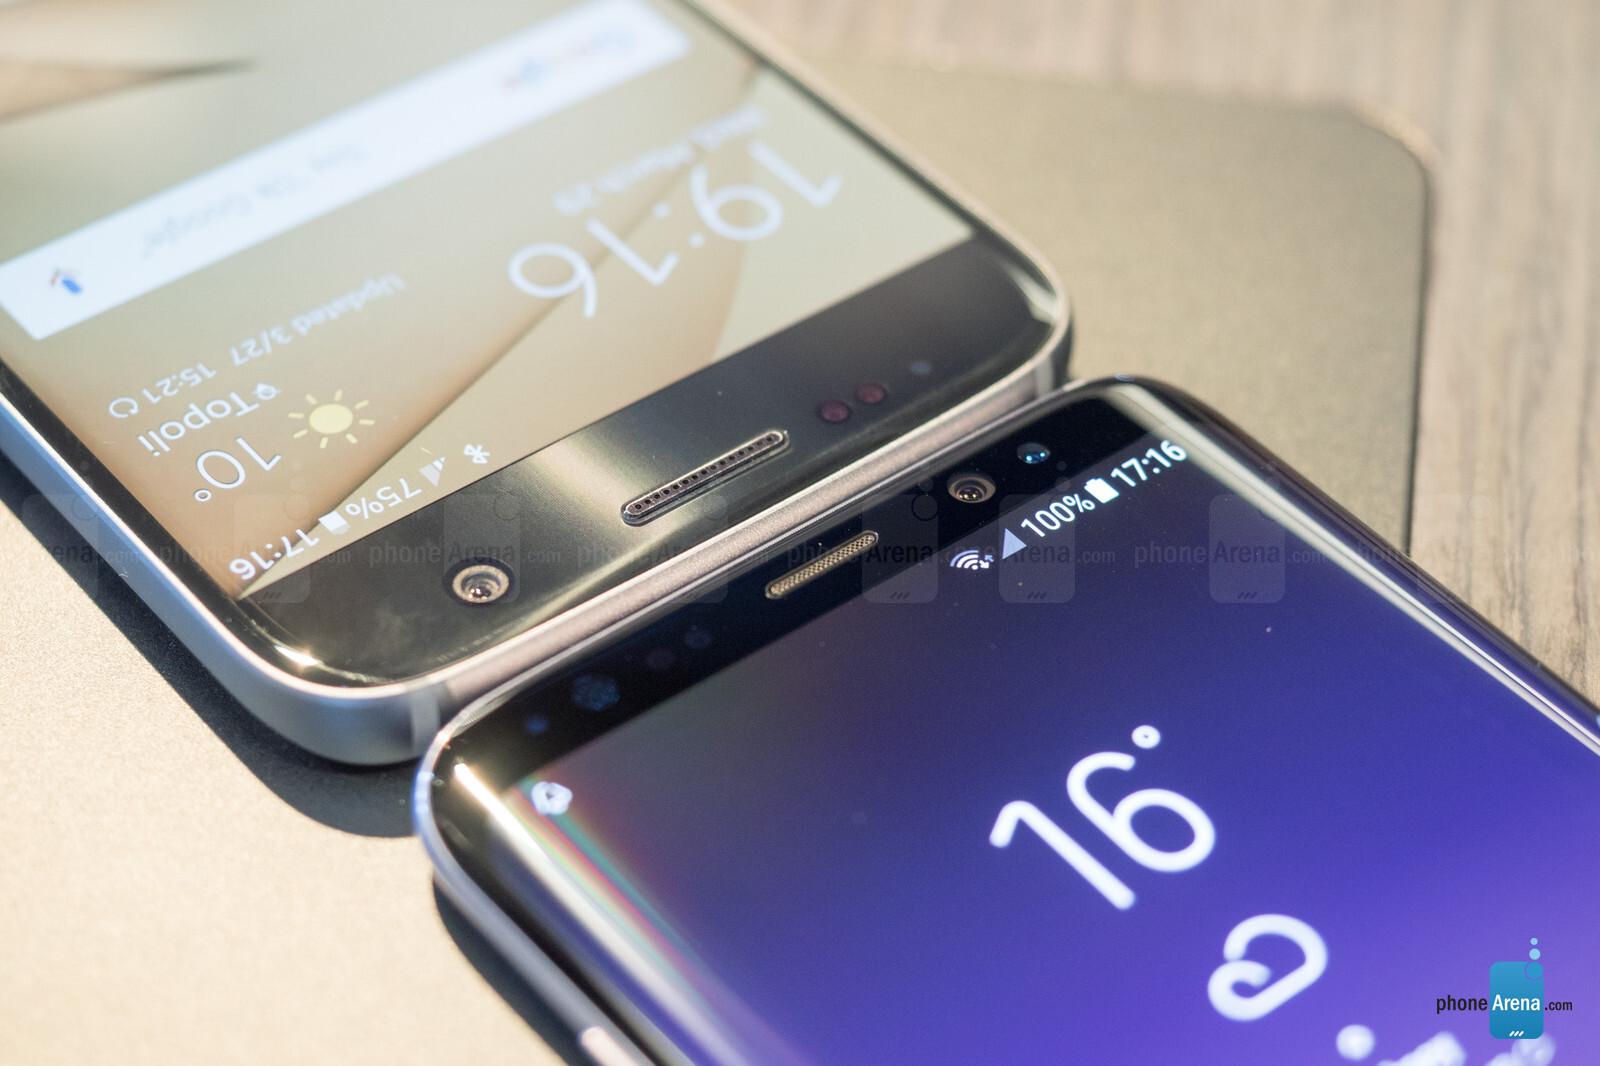 Samsung Galaxy S8 vs Galaxy S7: comparison and differences